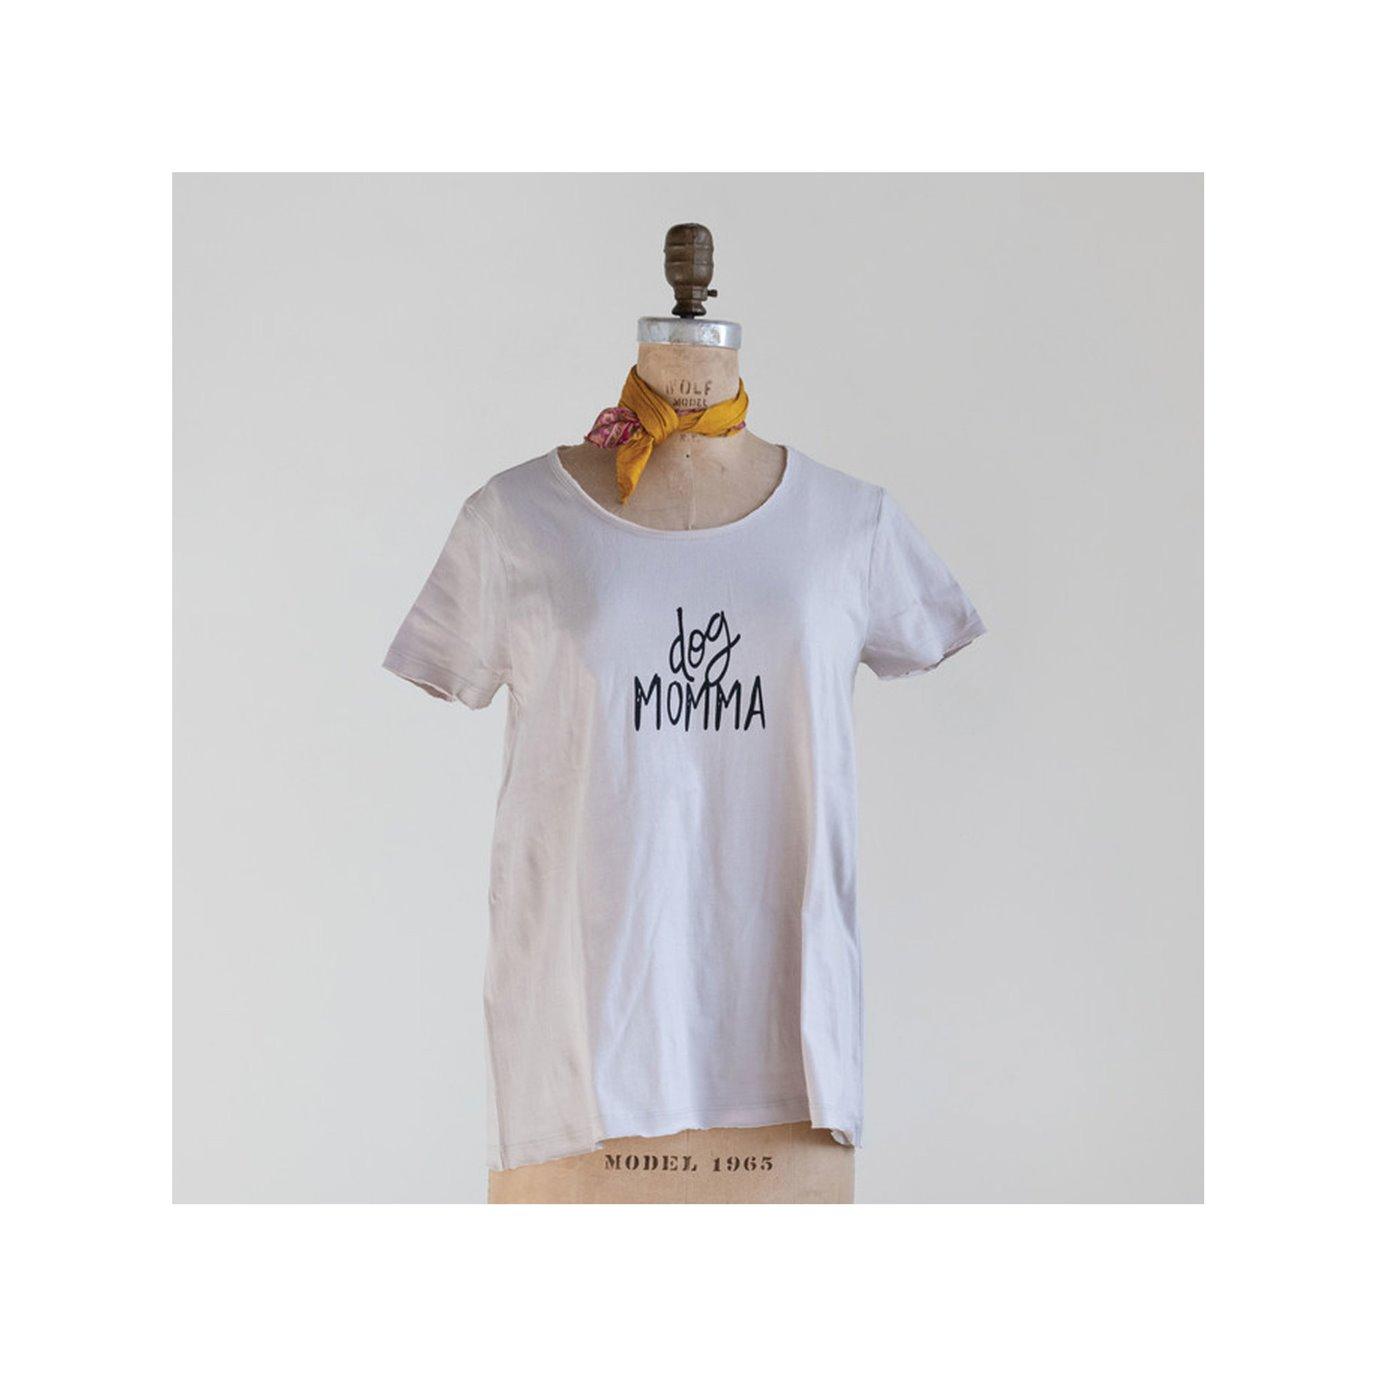 "Cotton Screen Printed T-Shirt ""Dog Momma"", Grey & Black, Medium"